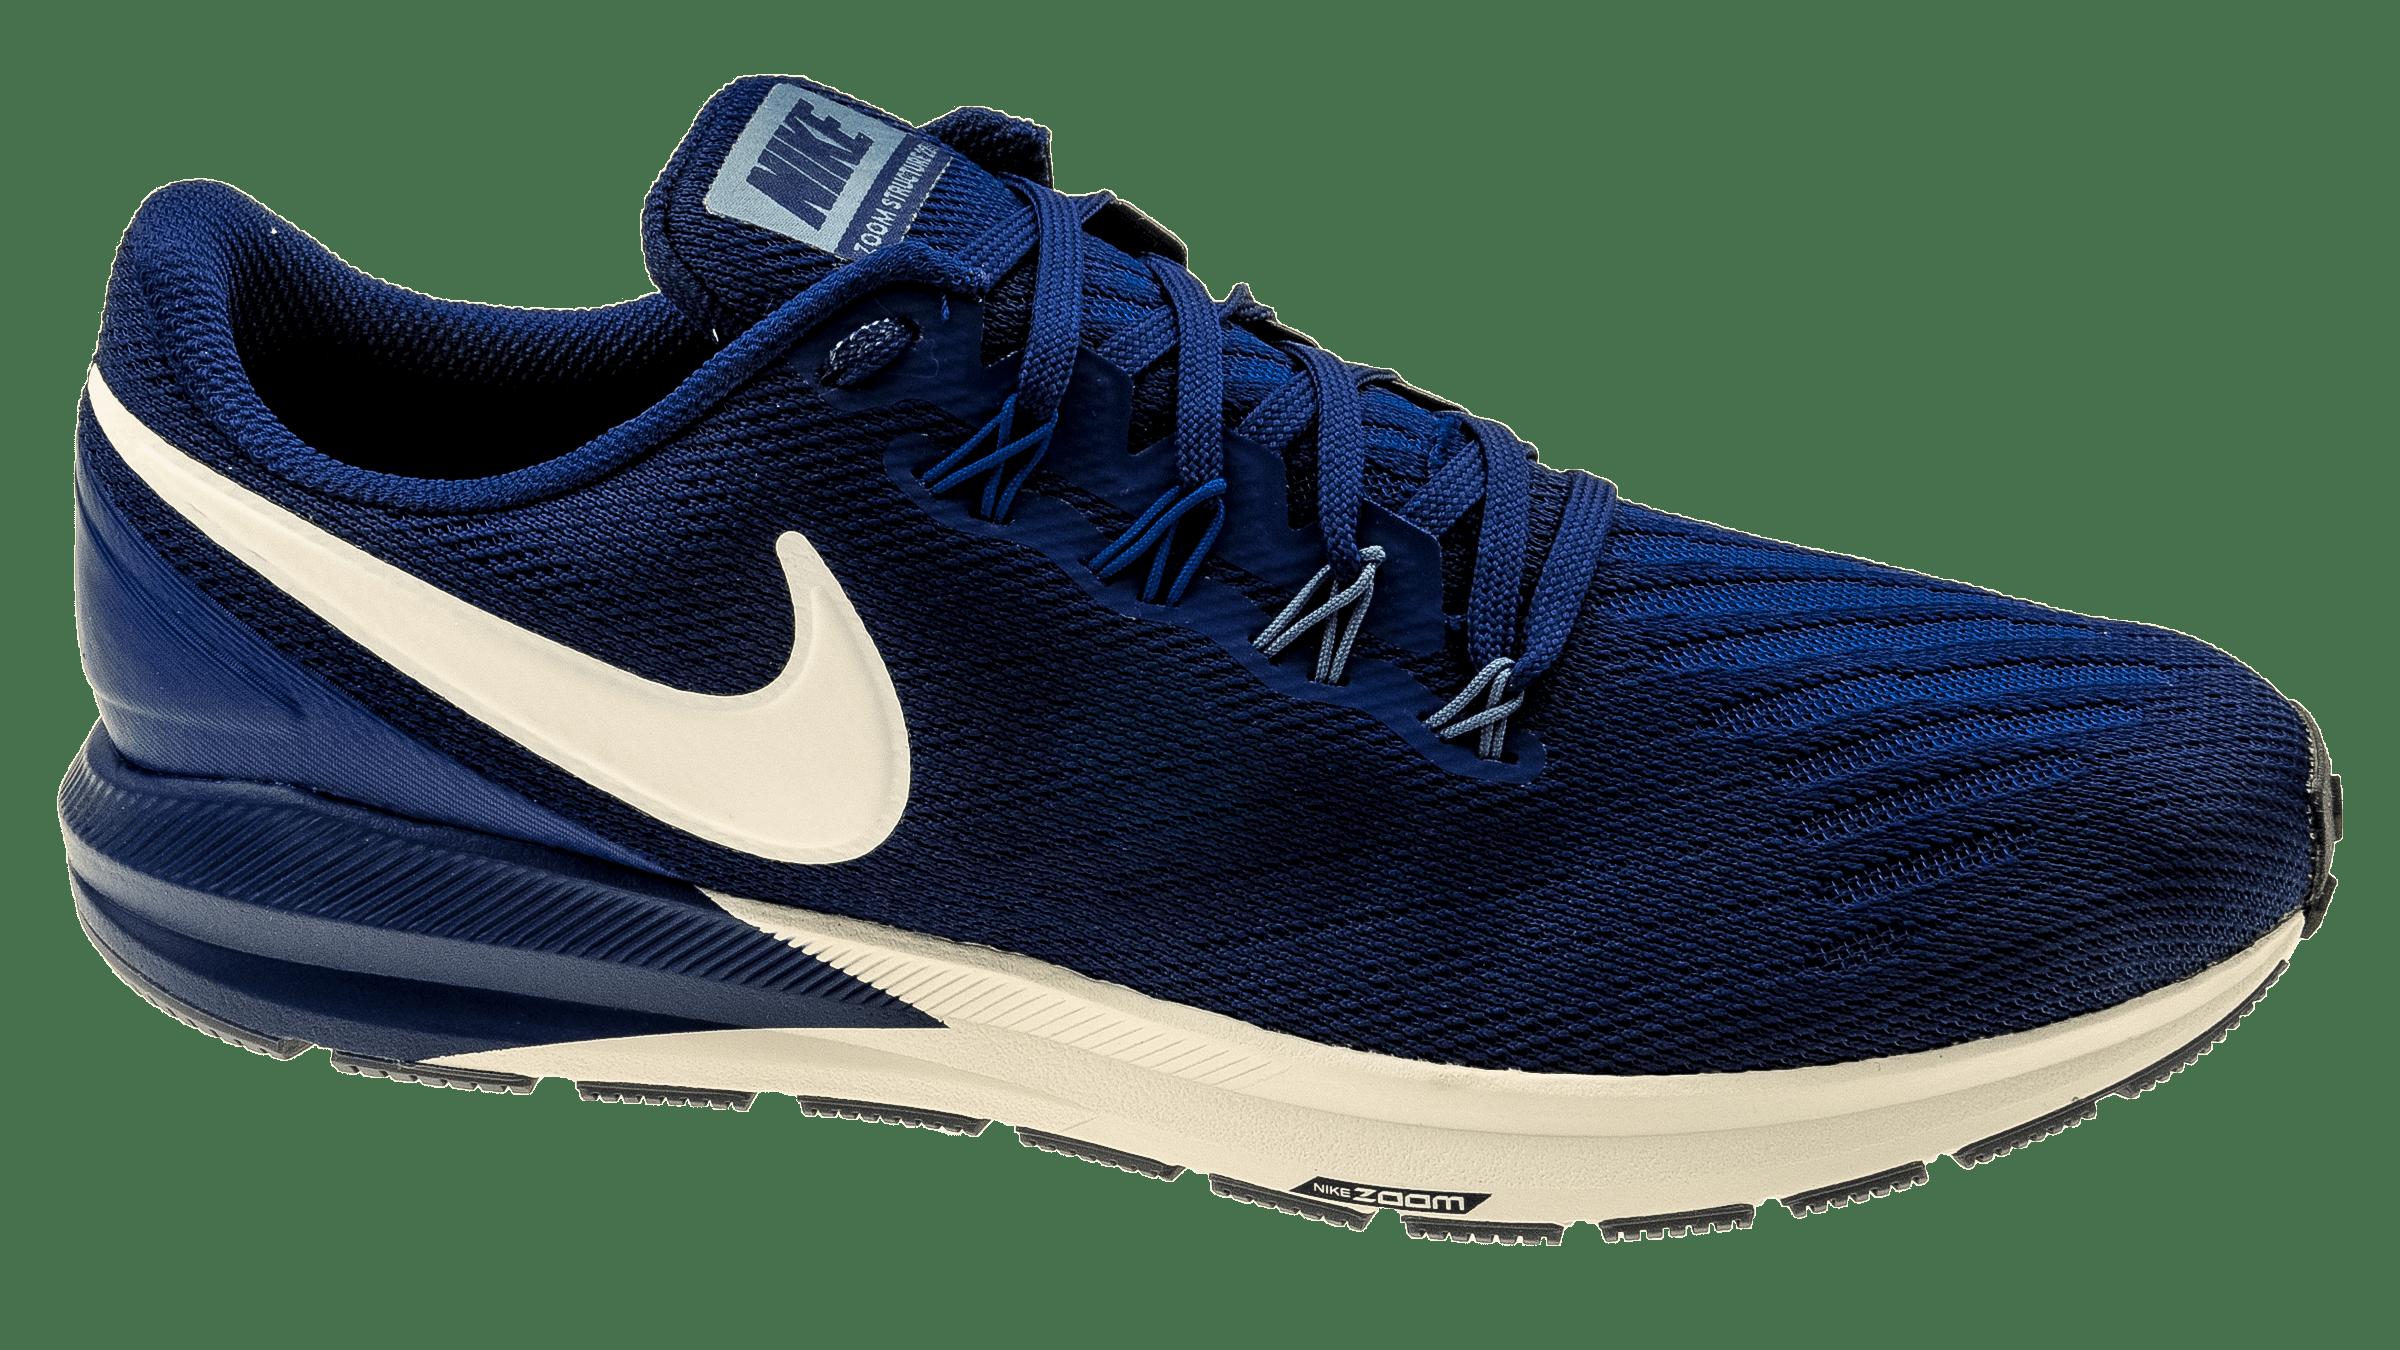 new product 4d262 e8d59 Nike Air Zoom Structure 22 blue voidvast greygym blue bestellen bij  Skate-dump.nl